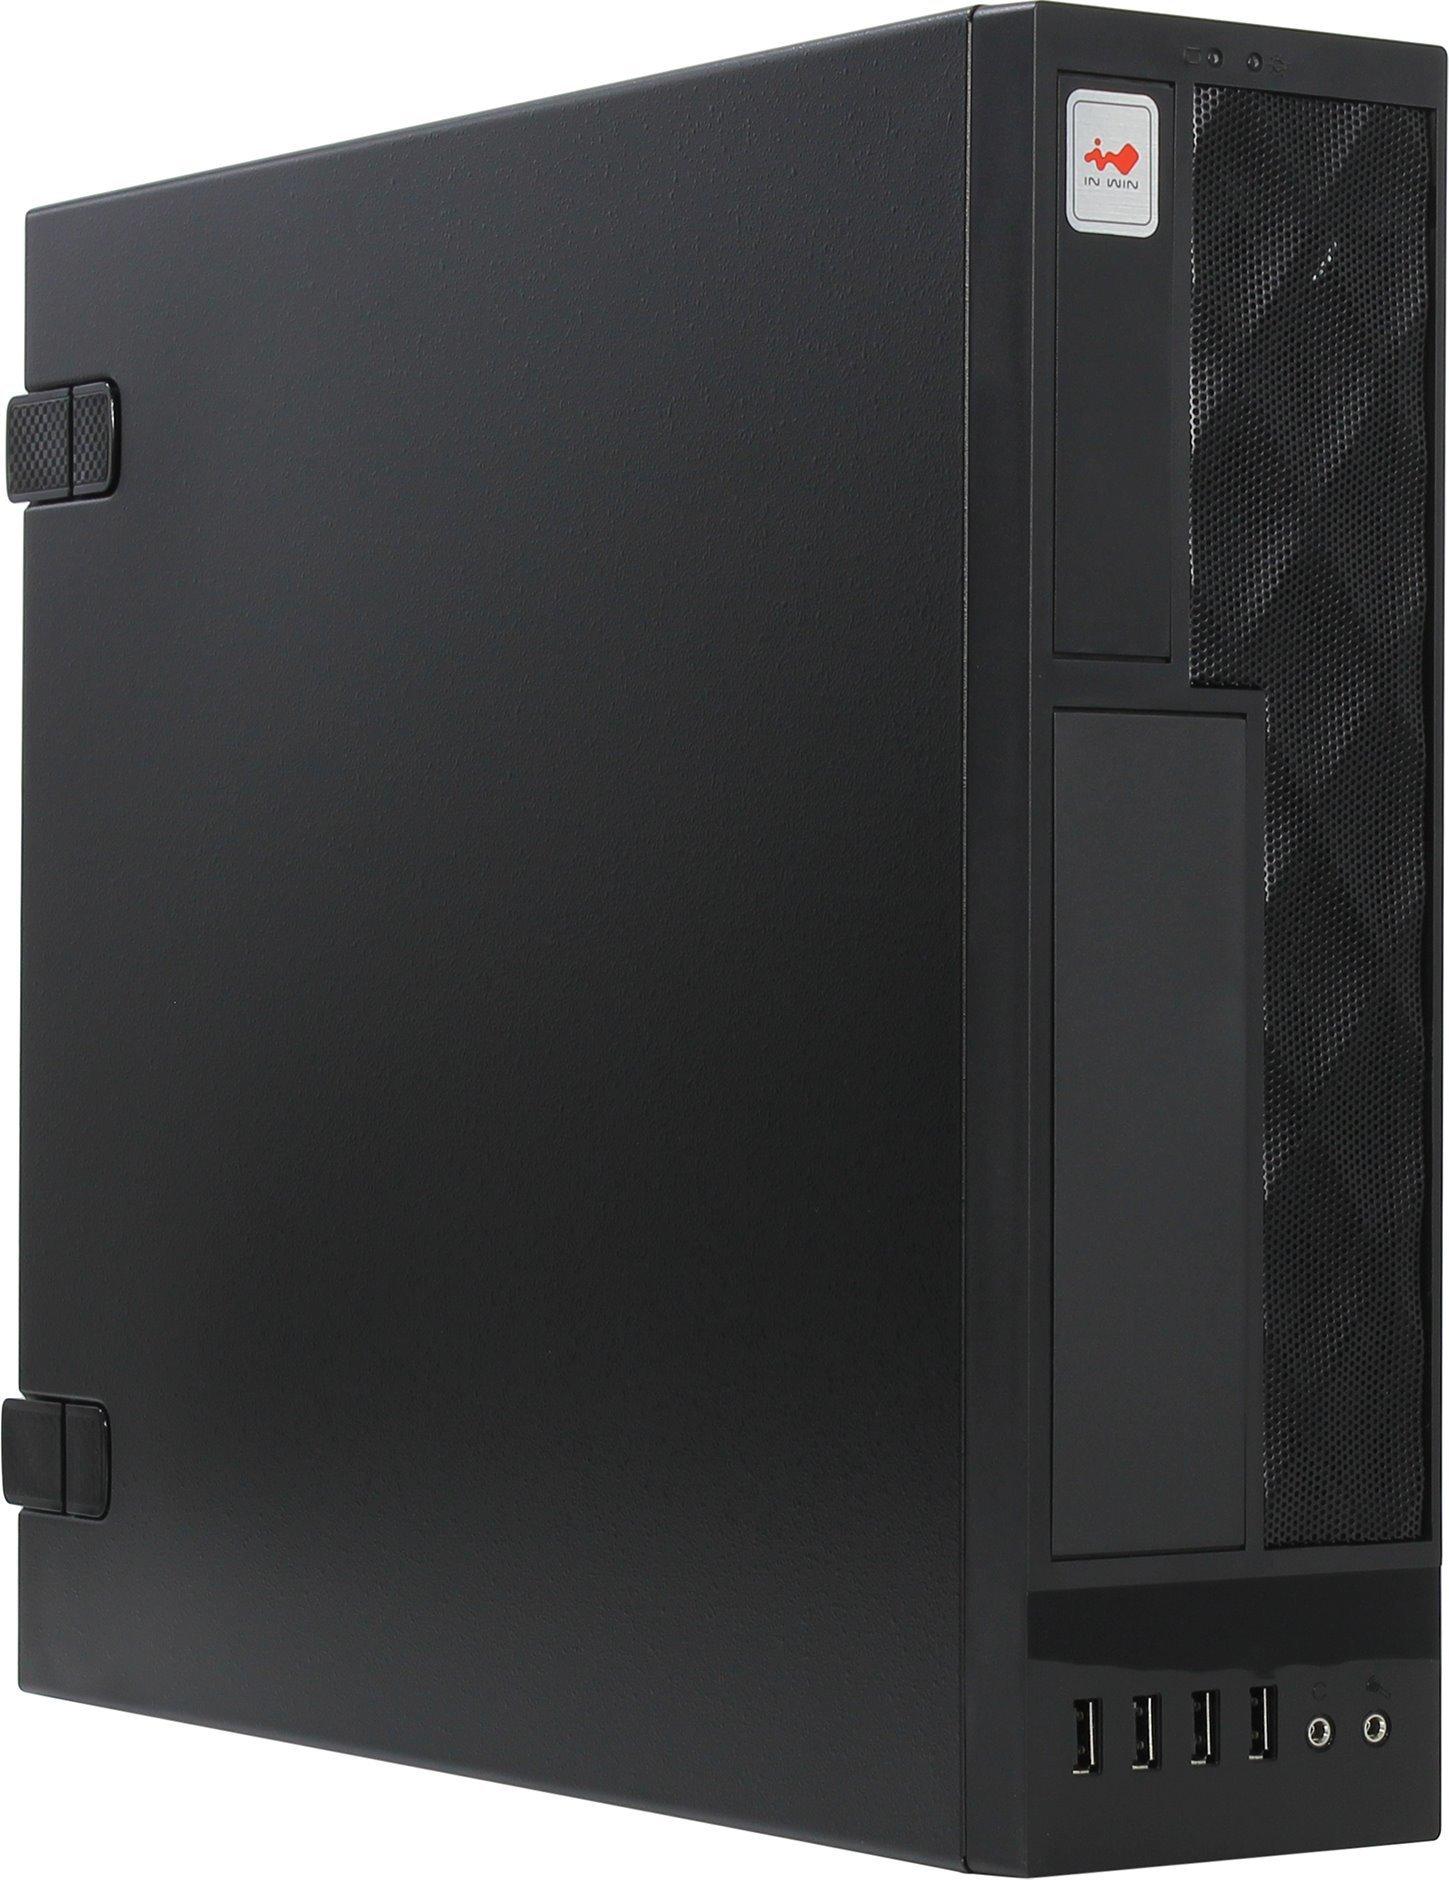 Корпус microATX InWin CE052S BL 300 Вт чёрный корпус microatx exegate mi 205l 300 вт чёрный серебристый ex249478rus